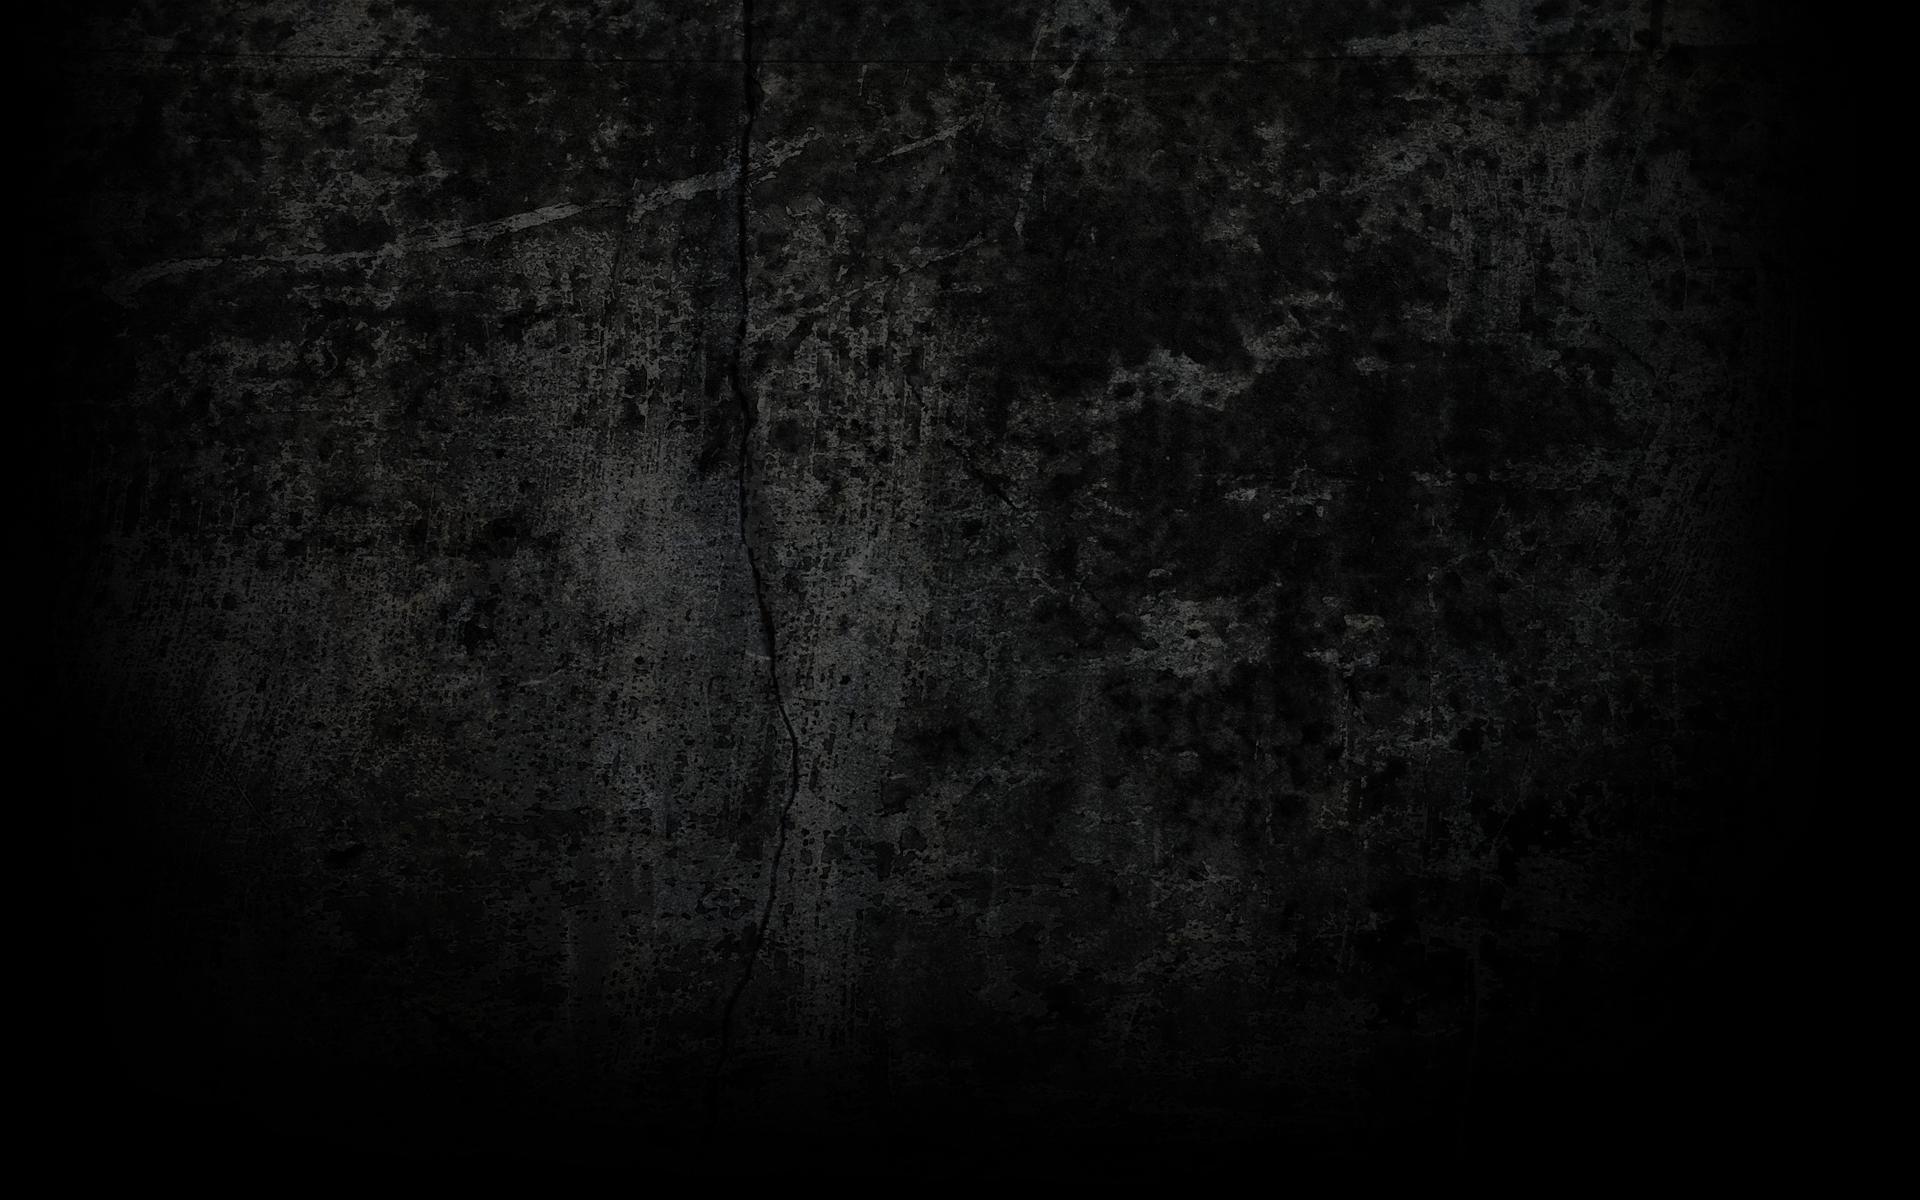 Amazing Full HD P Grunge Wallpapers HD, Desktop Backgrounds 1920×1080 Grunge  Desktop Wallpapers (27 Wallpapers) | Adorable Wallpapers